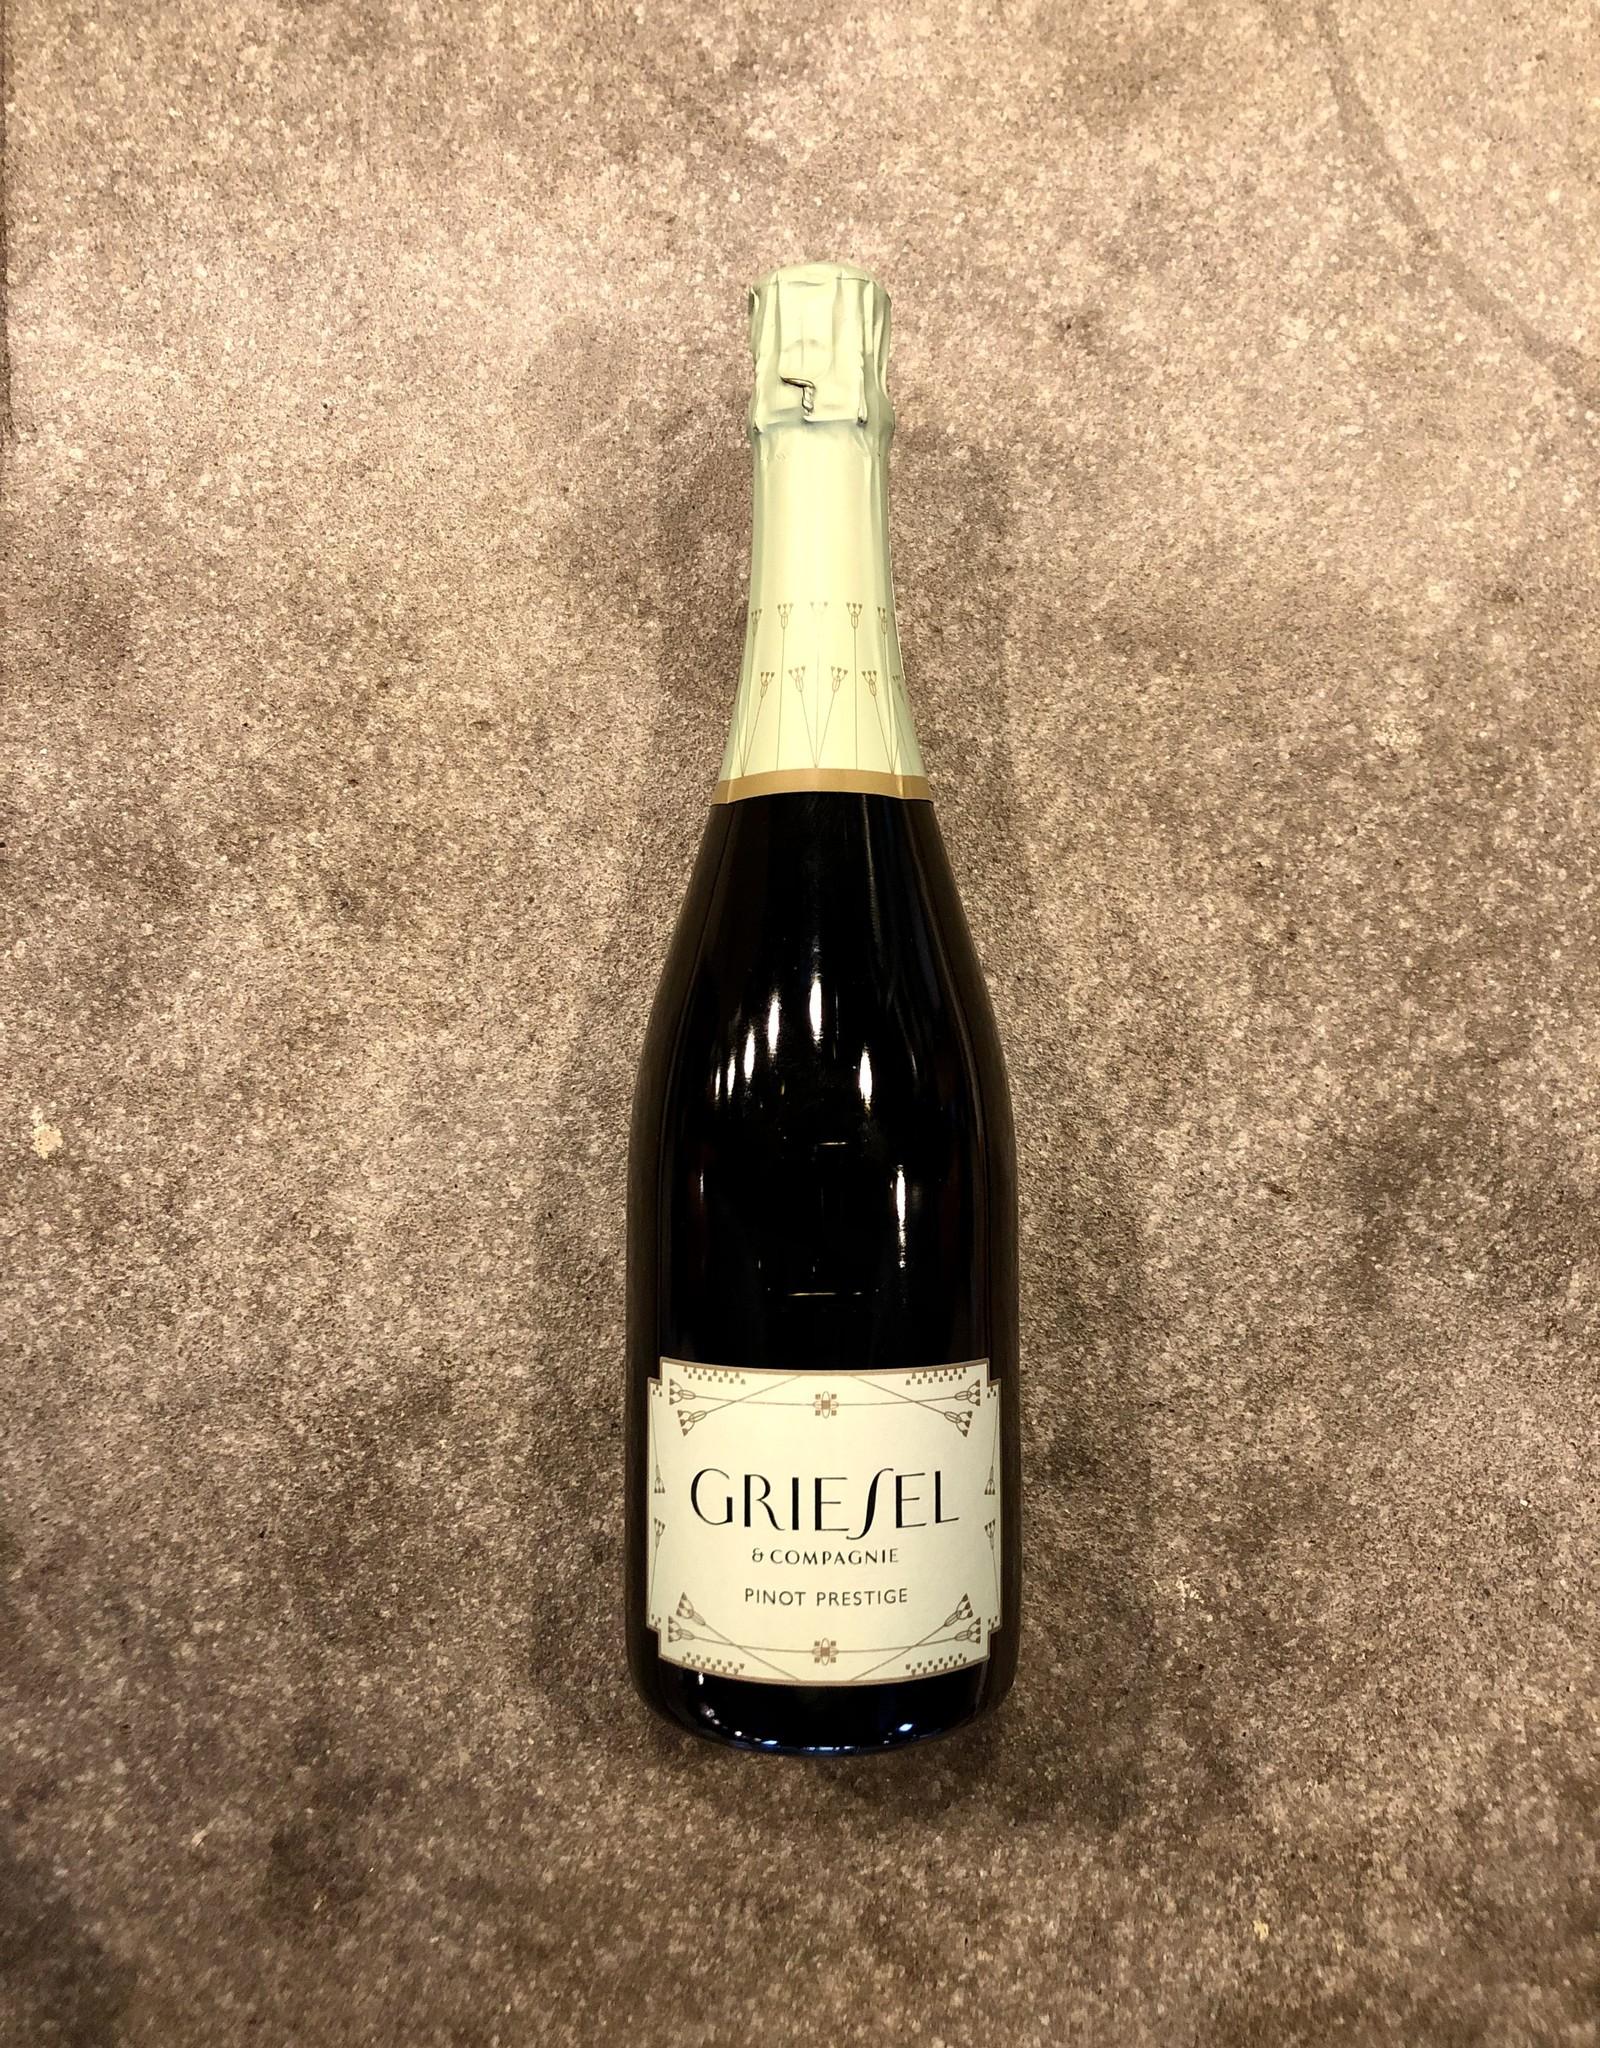 Griesel Sekt Pinot Prestige Brut Nature 2017